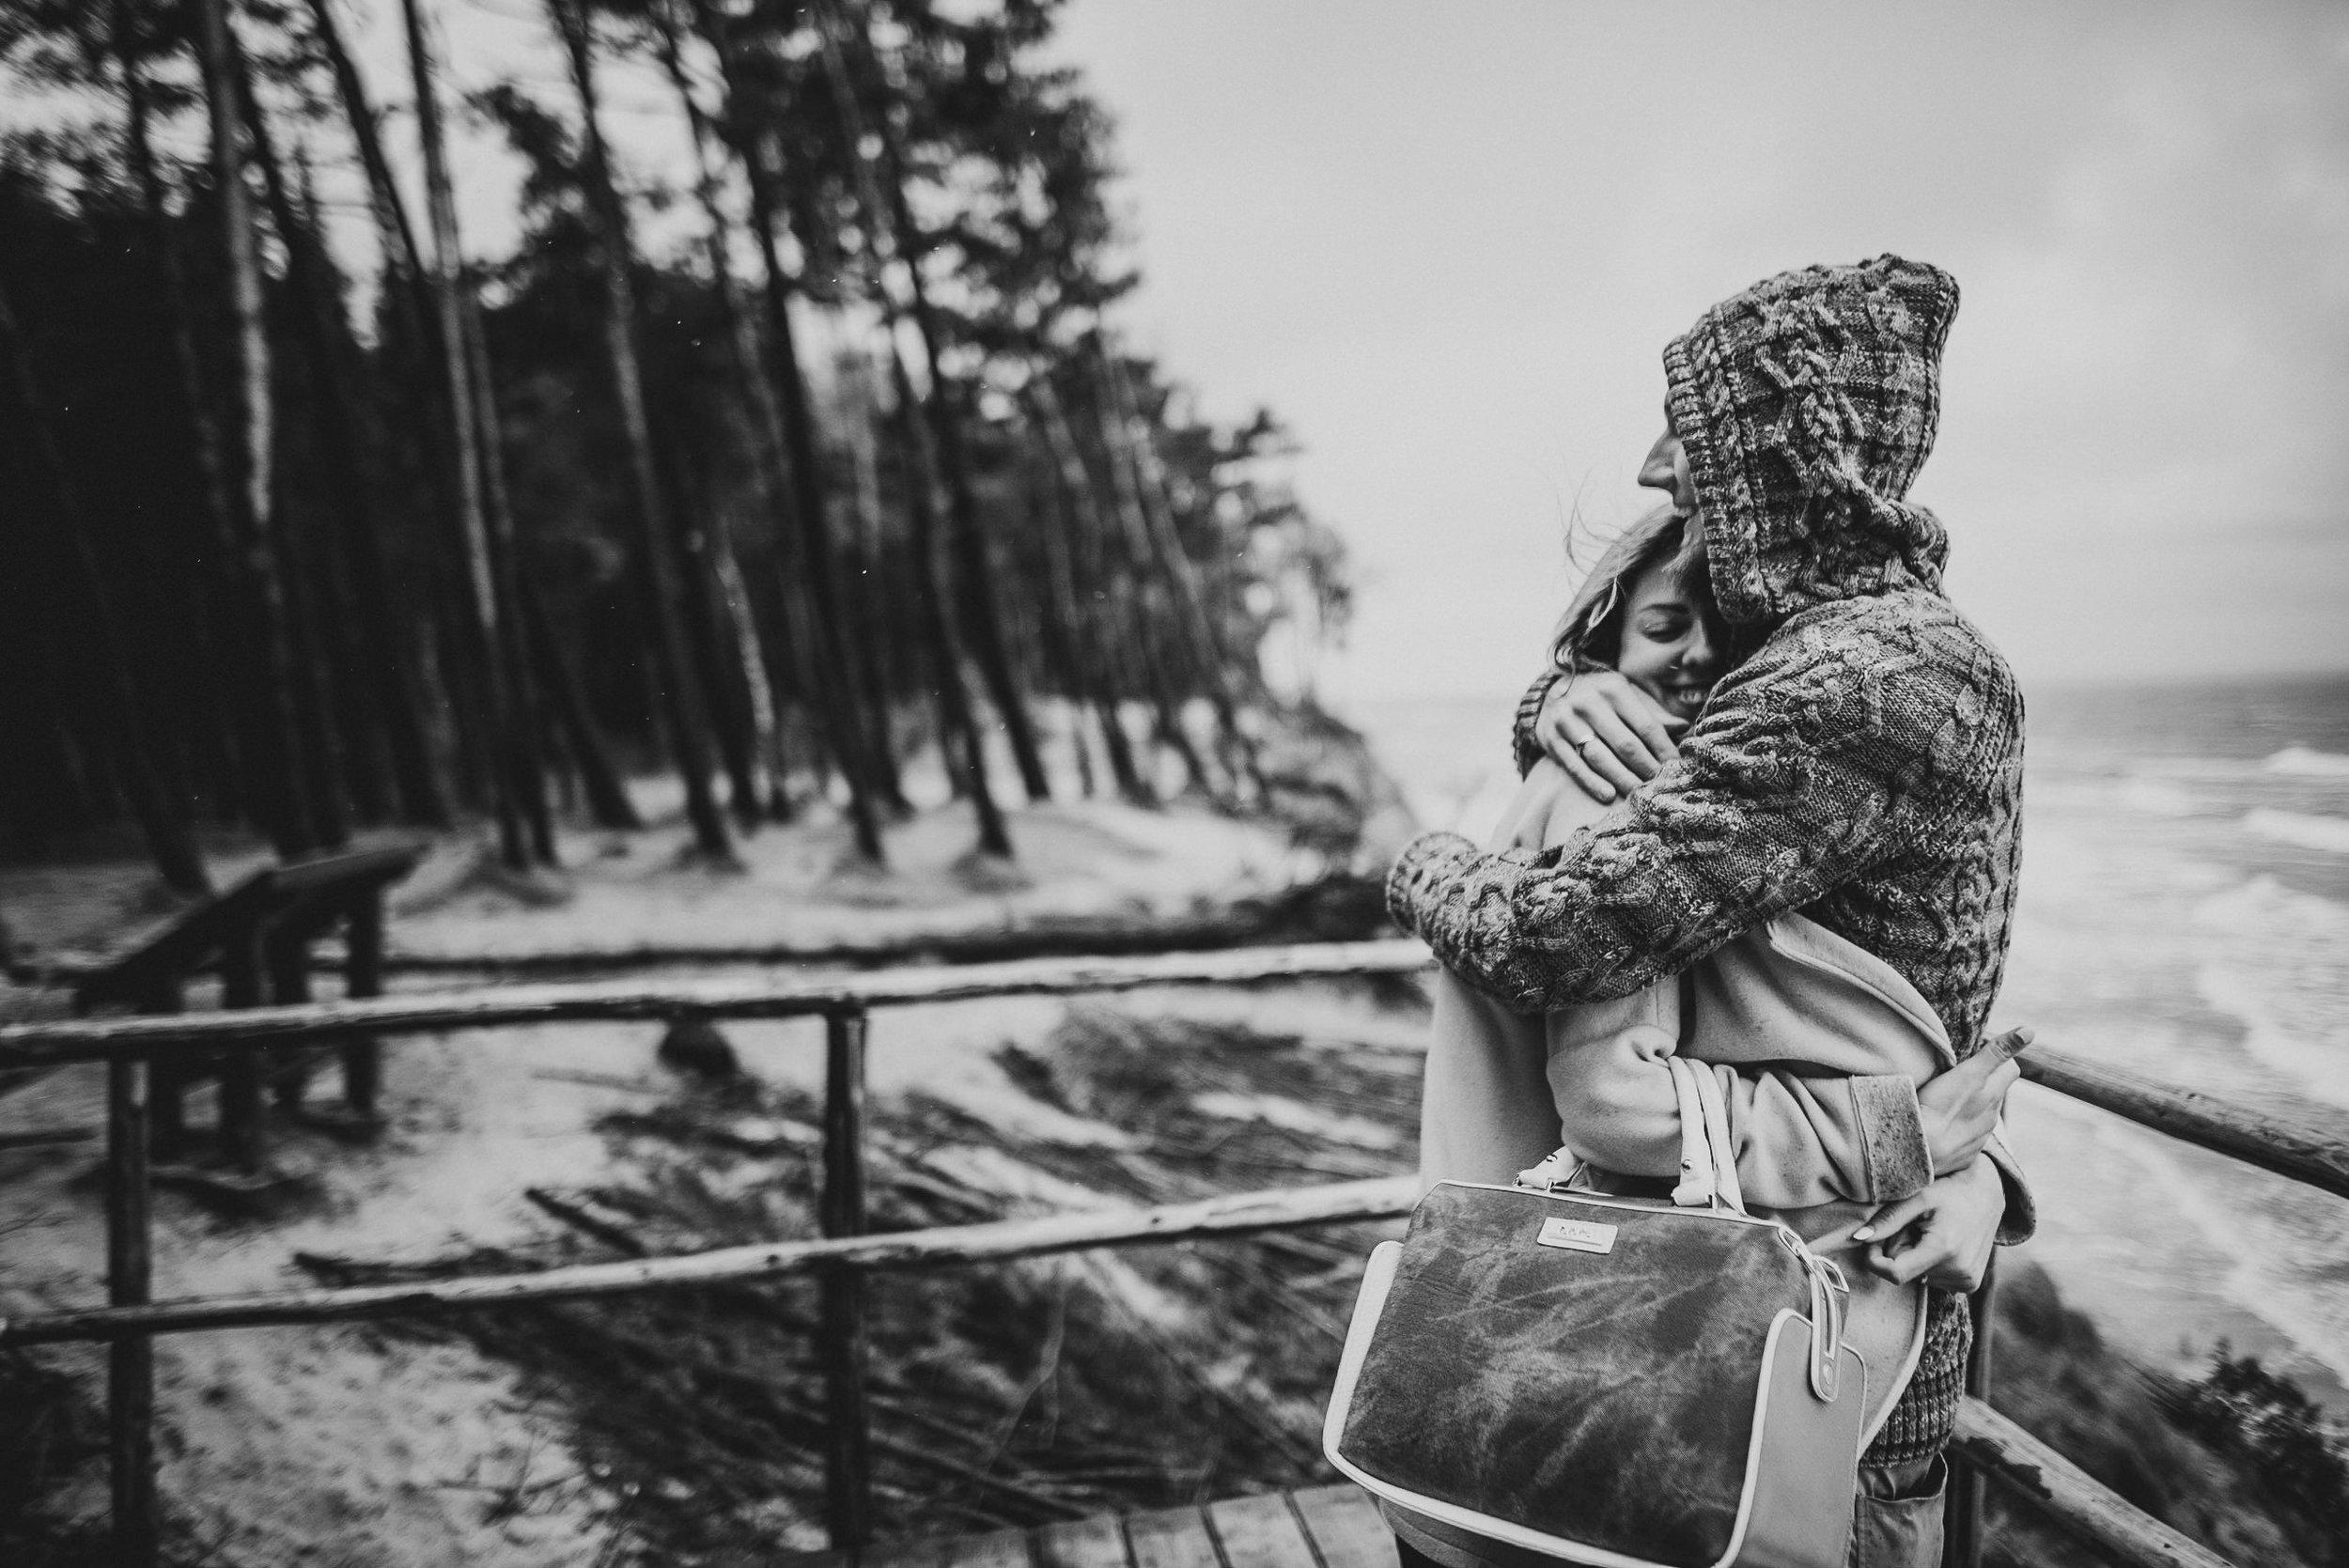 Olando kepure fotosesija Fotografas Mantas Kubilinskas-8.jpg